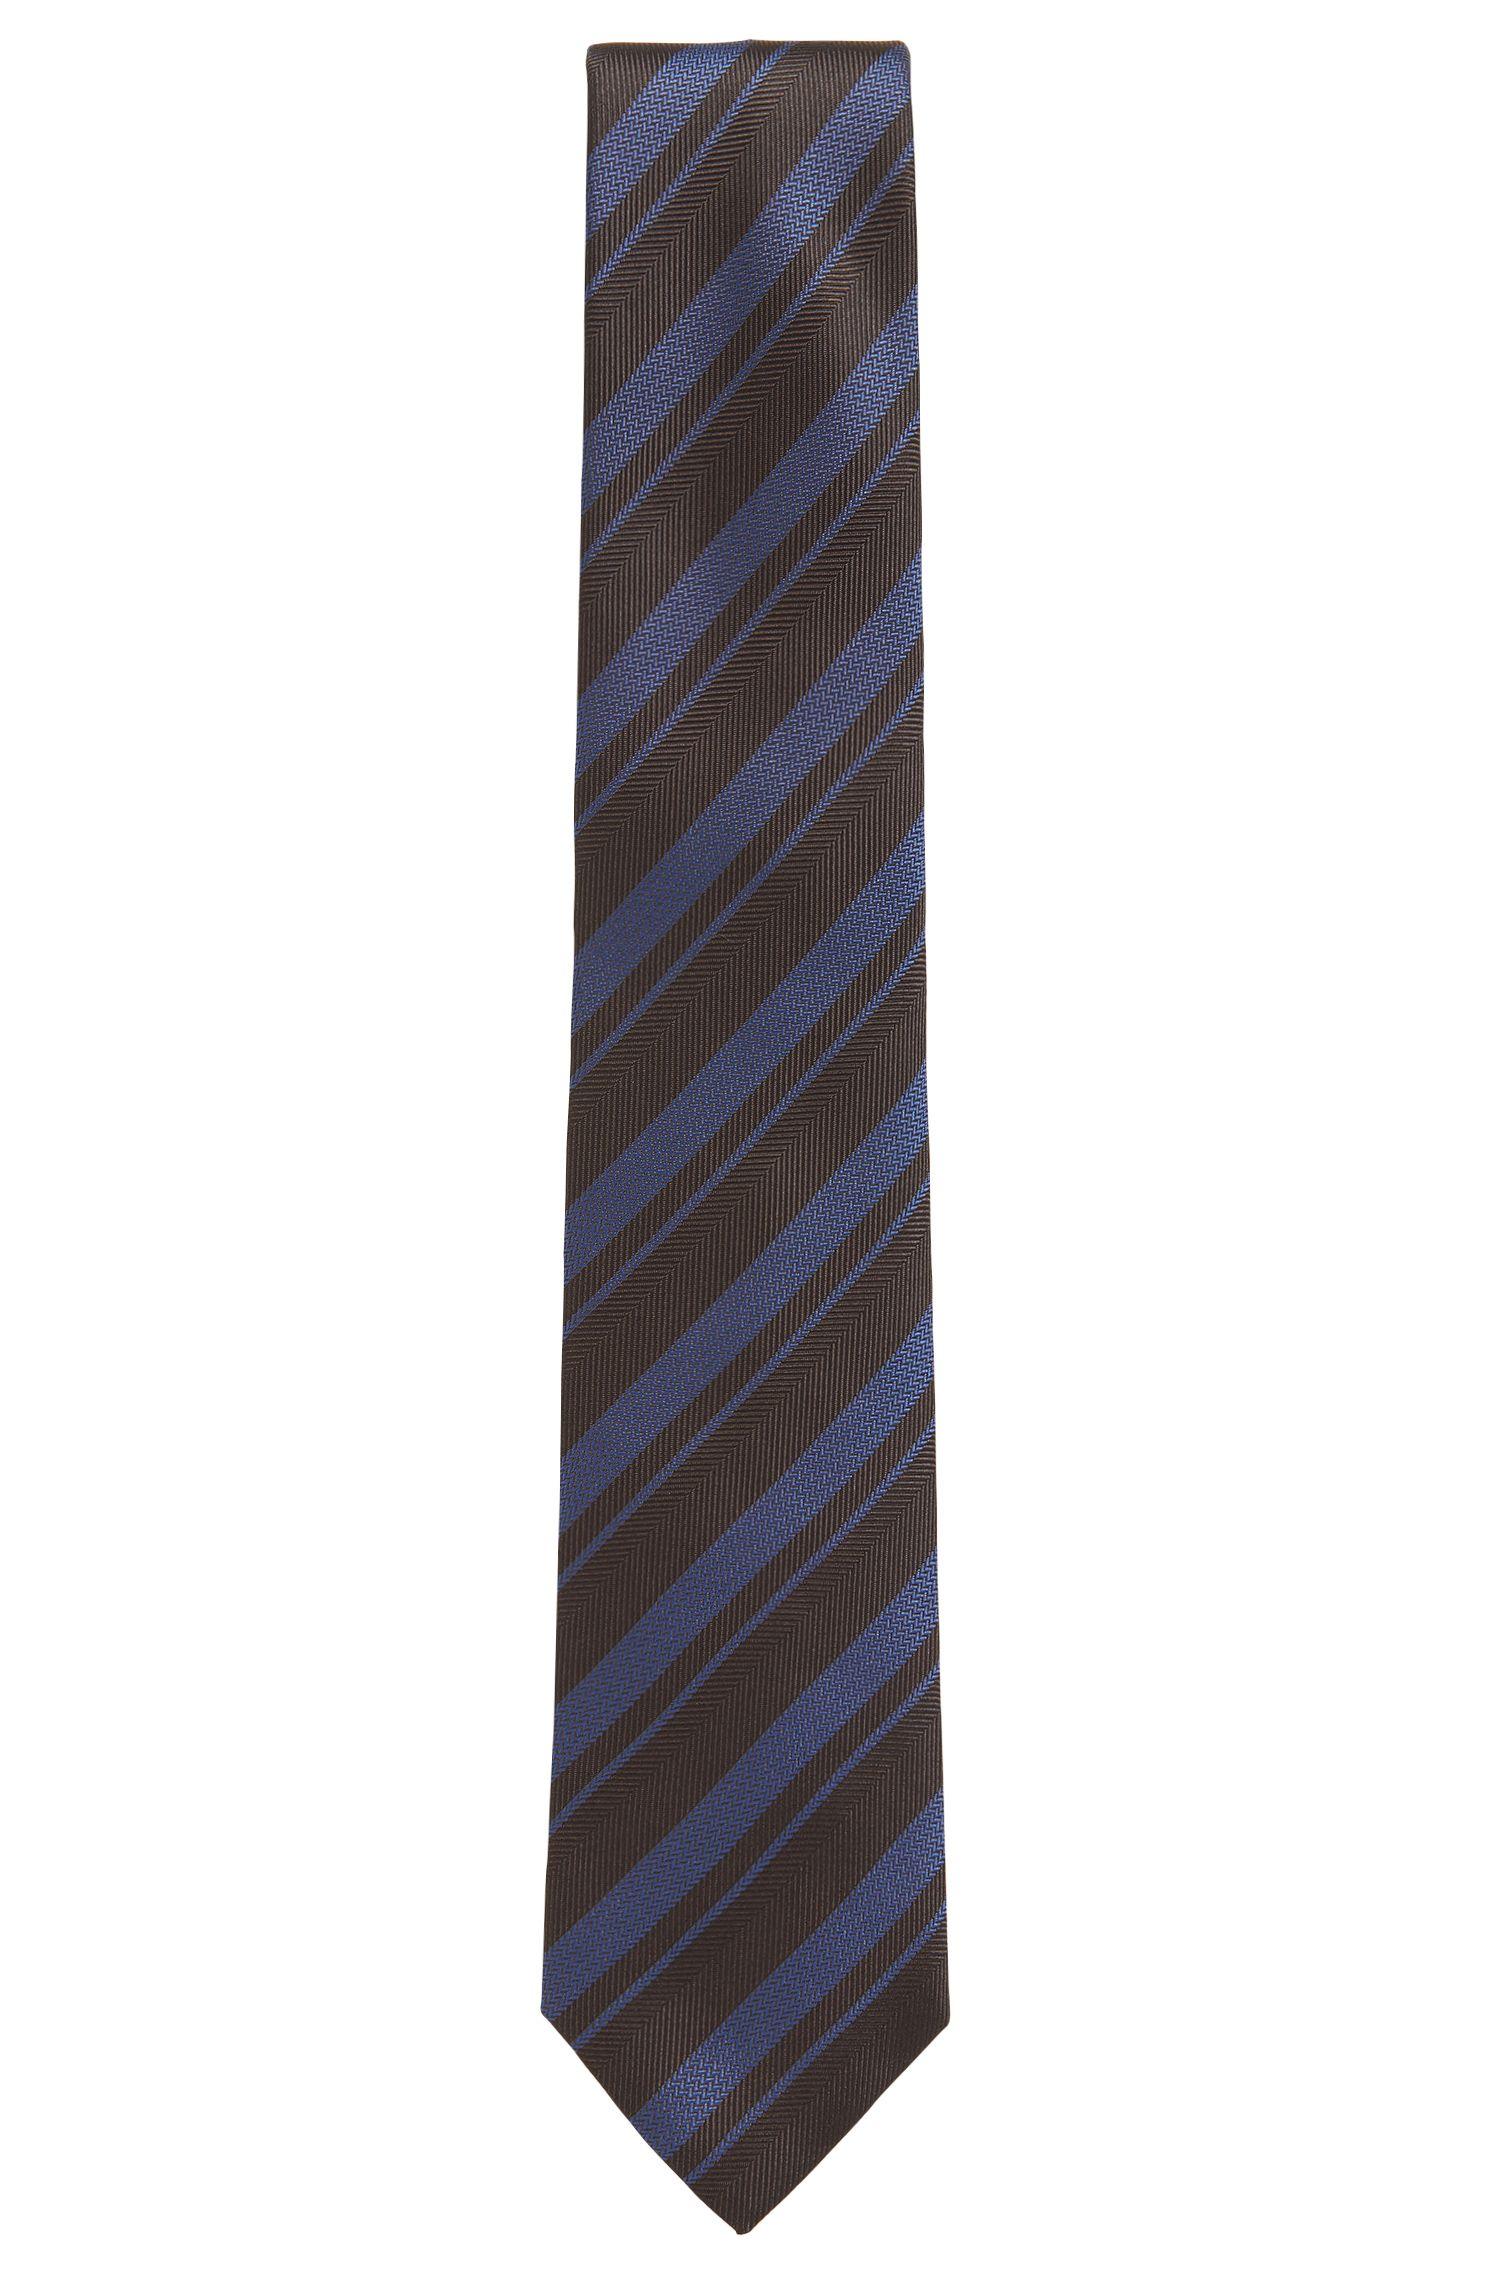 BOSS Tailored Striped Silk Slim Tie, Dark Purple